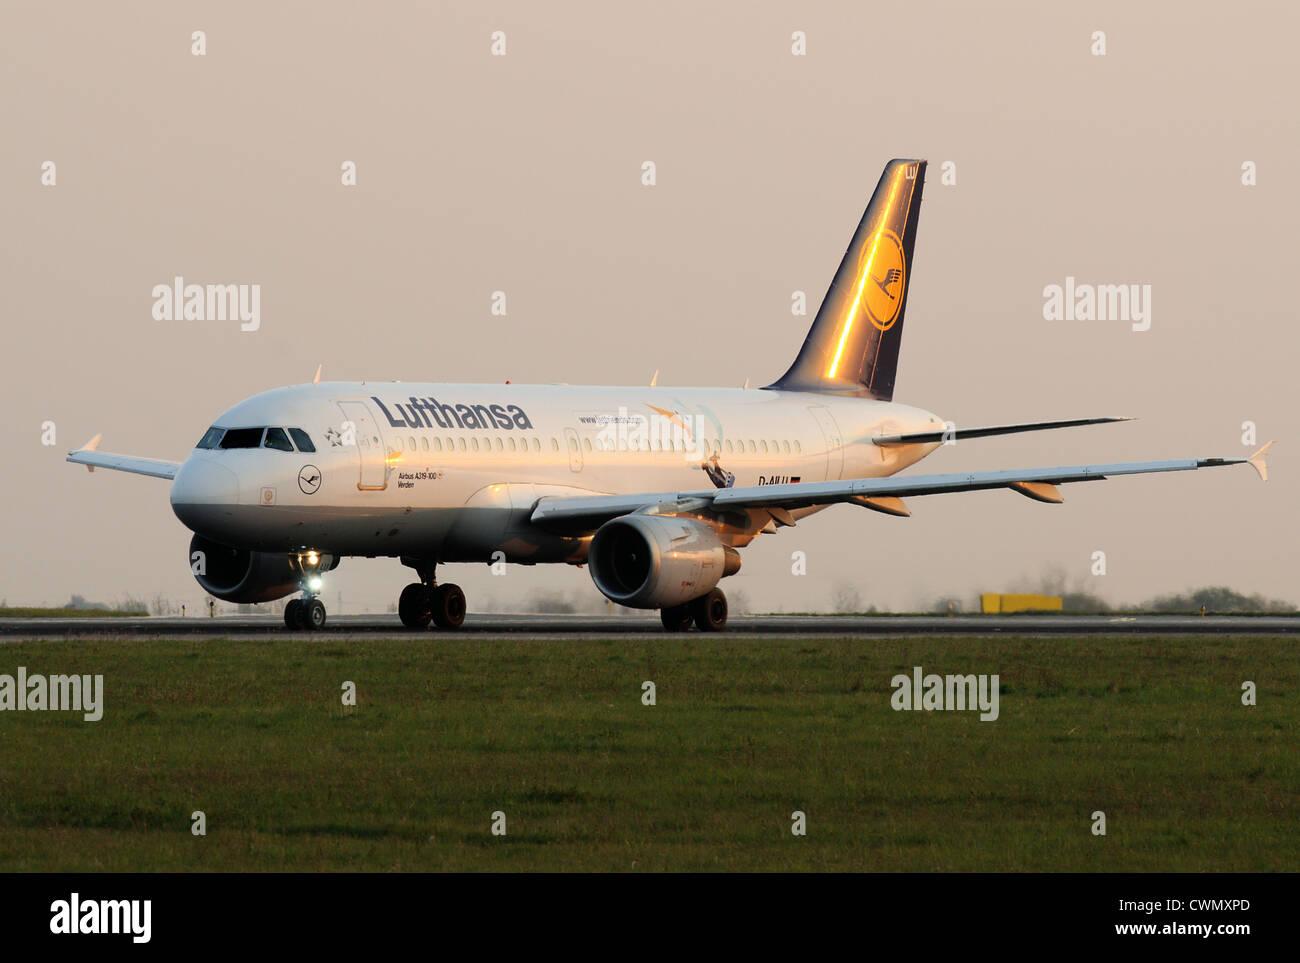 Lufthansa Airbus A319 - Stock Image